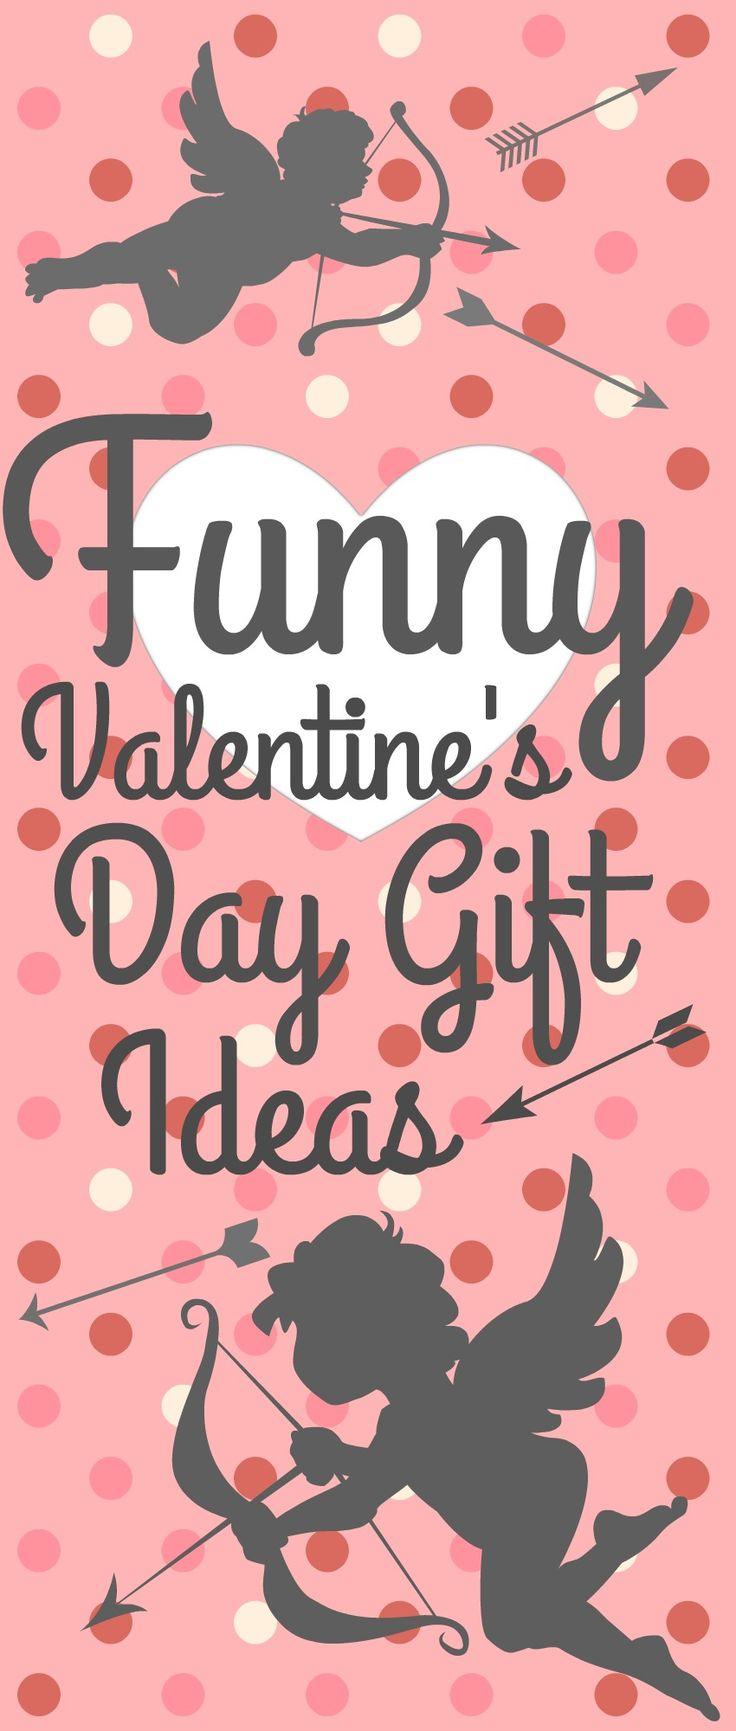 188 best Valentine's Day images on Pinterest